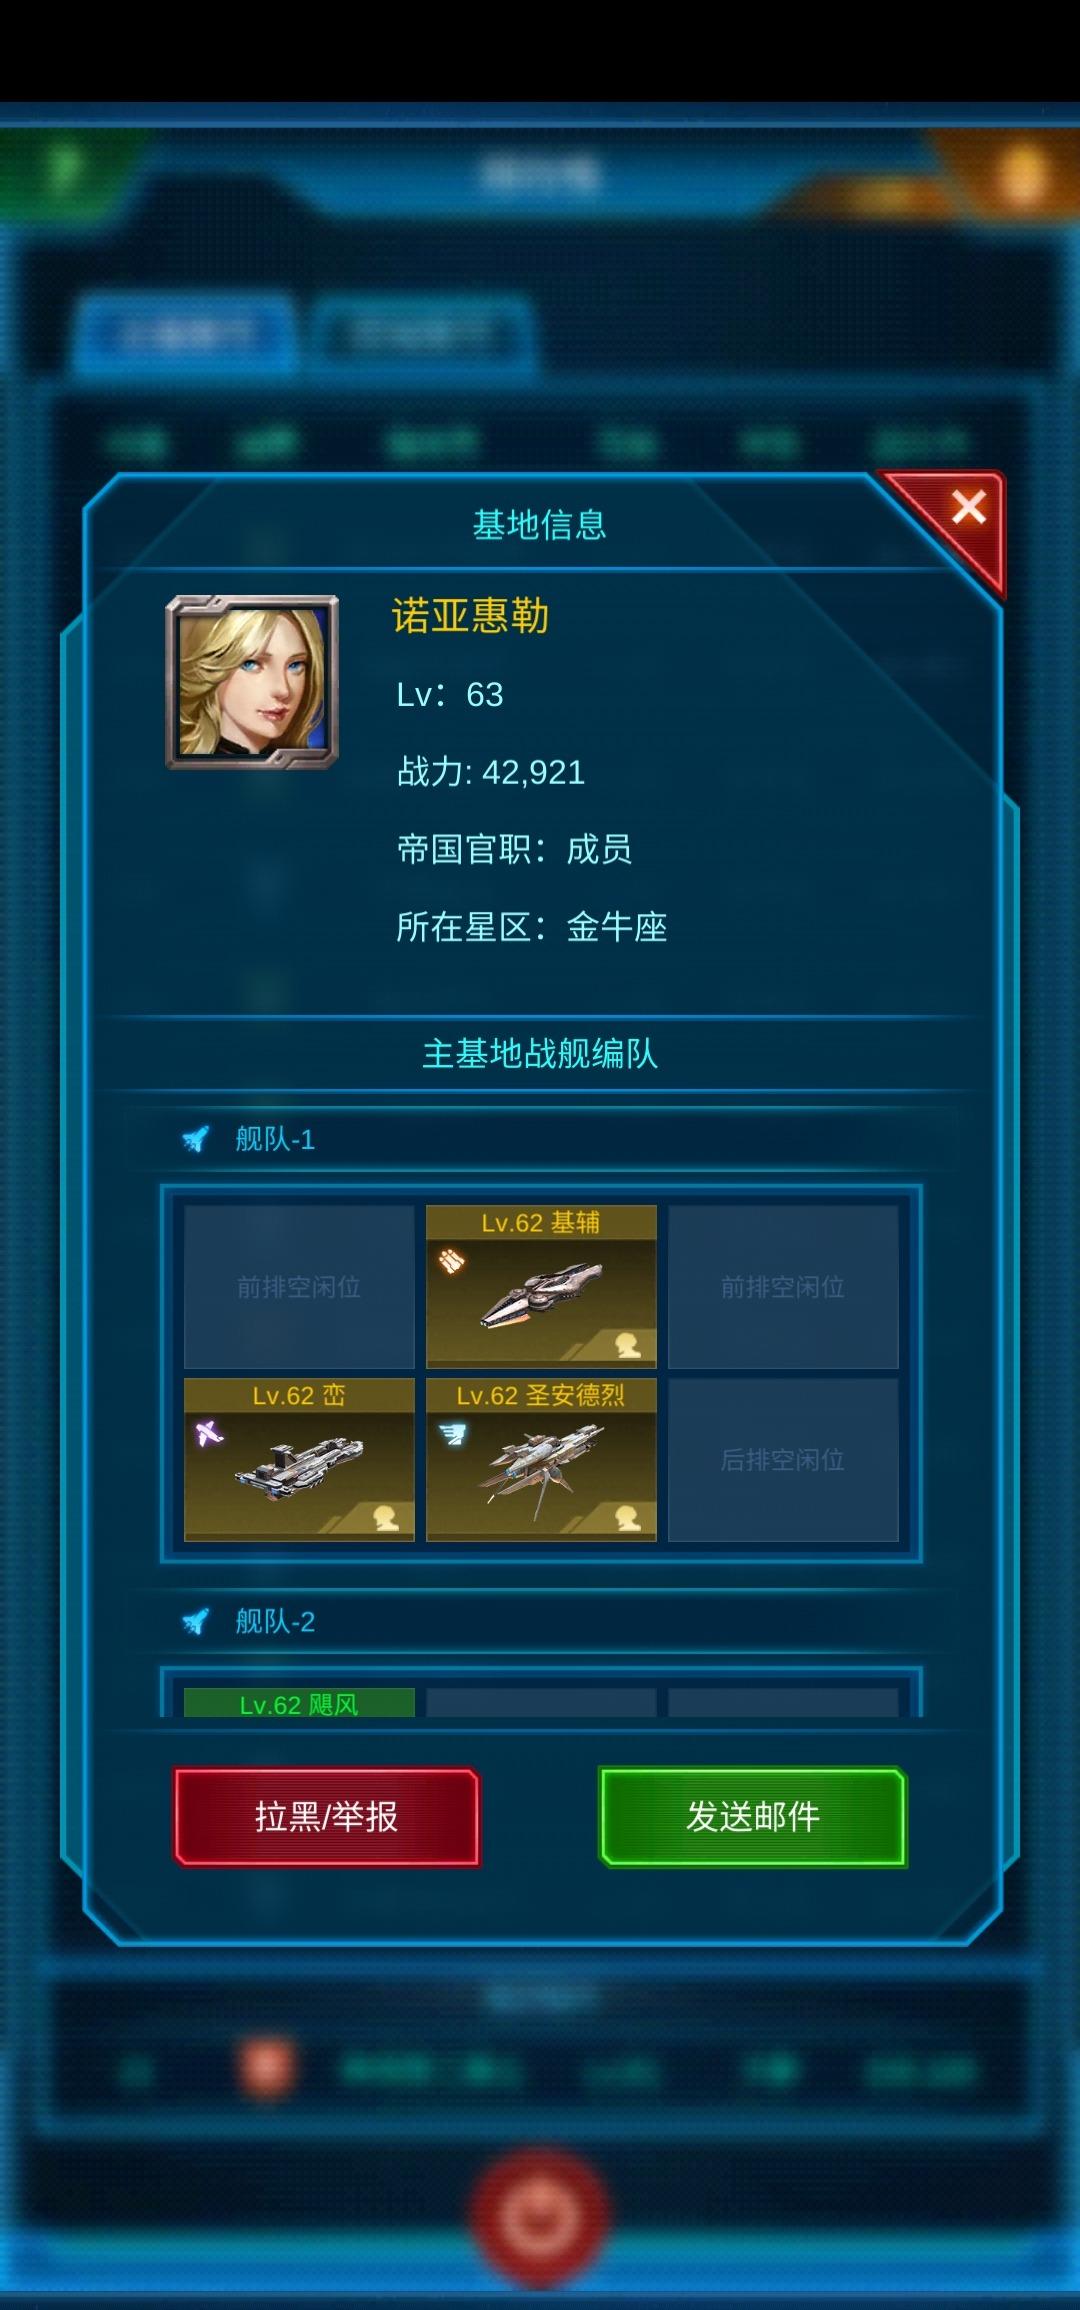 Screenshot_20200219_142454_com.jedigames.p16s.mi.jpg